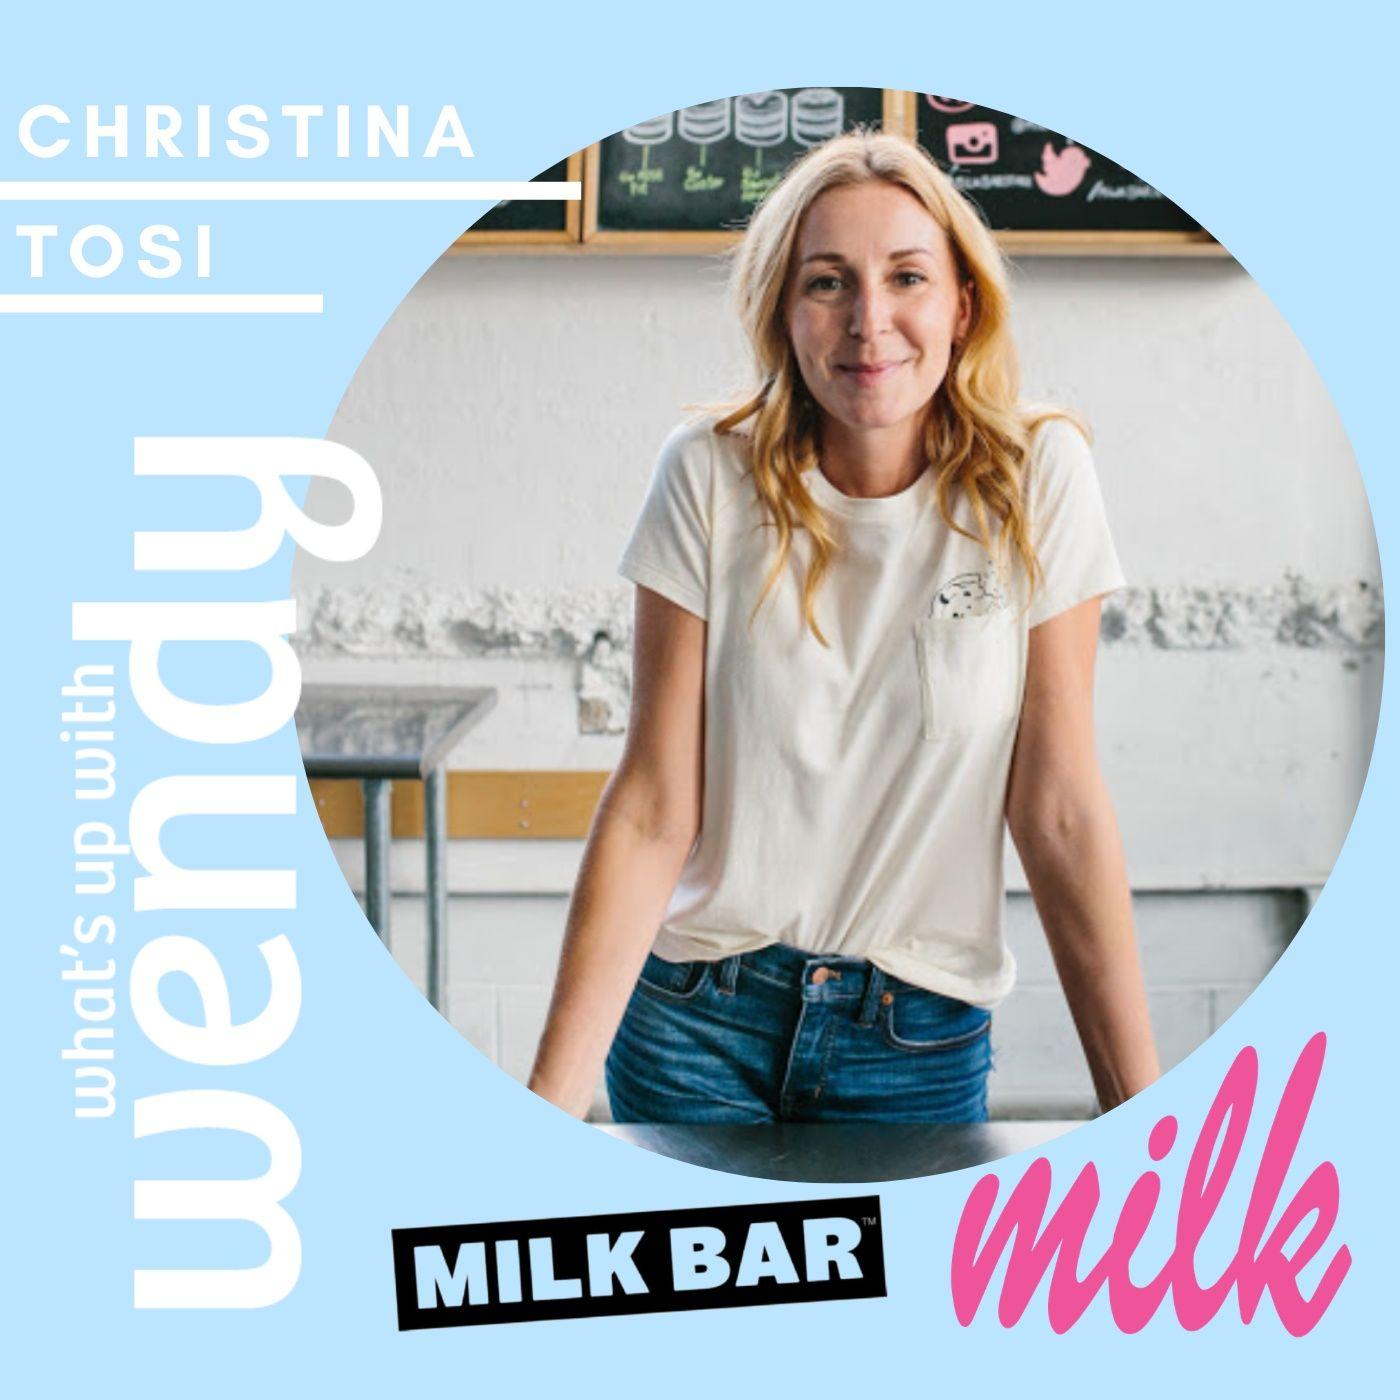 Christina Tosi, Award-Winning Chef and founder of Milk Bar